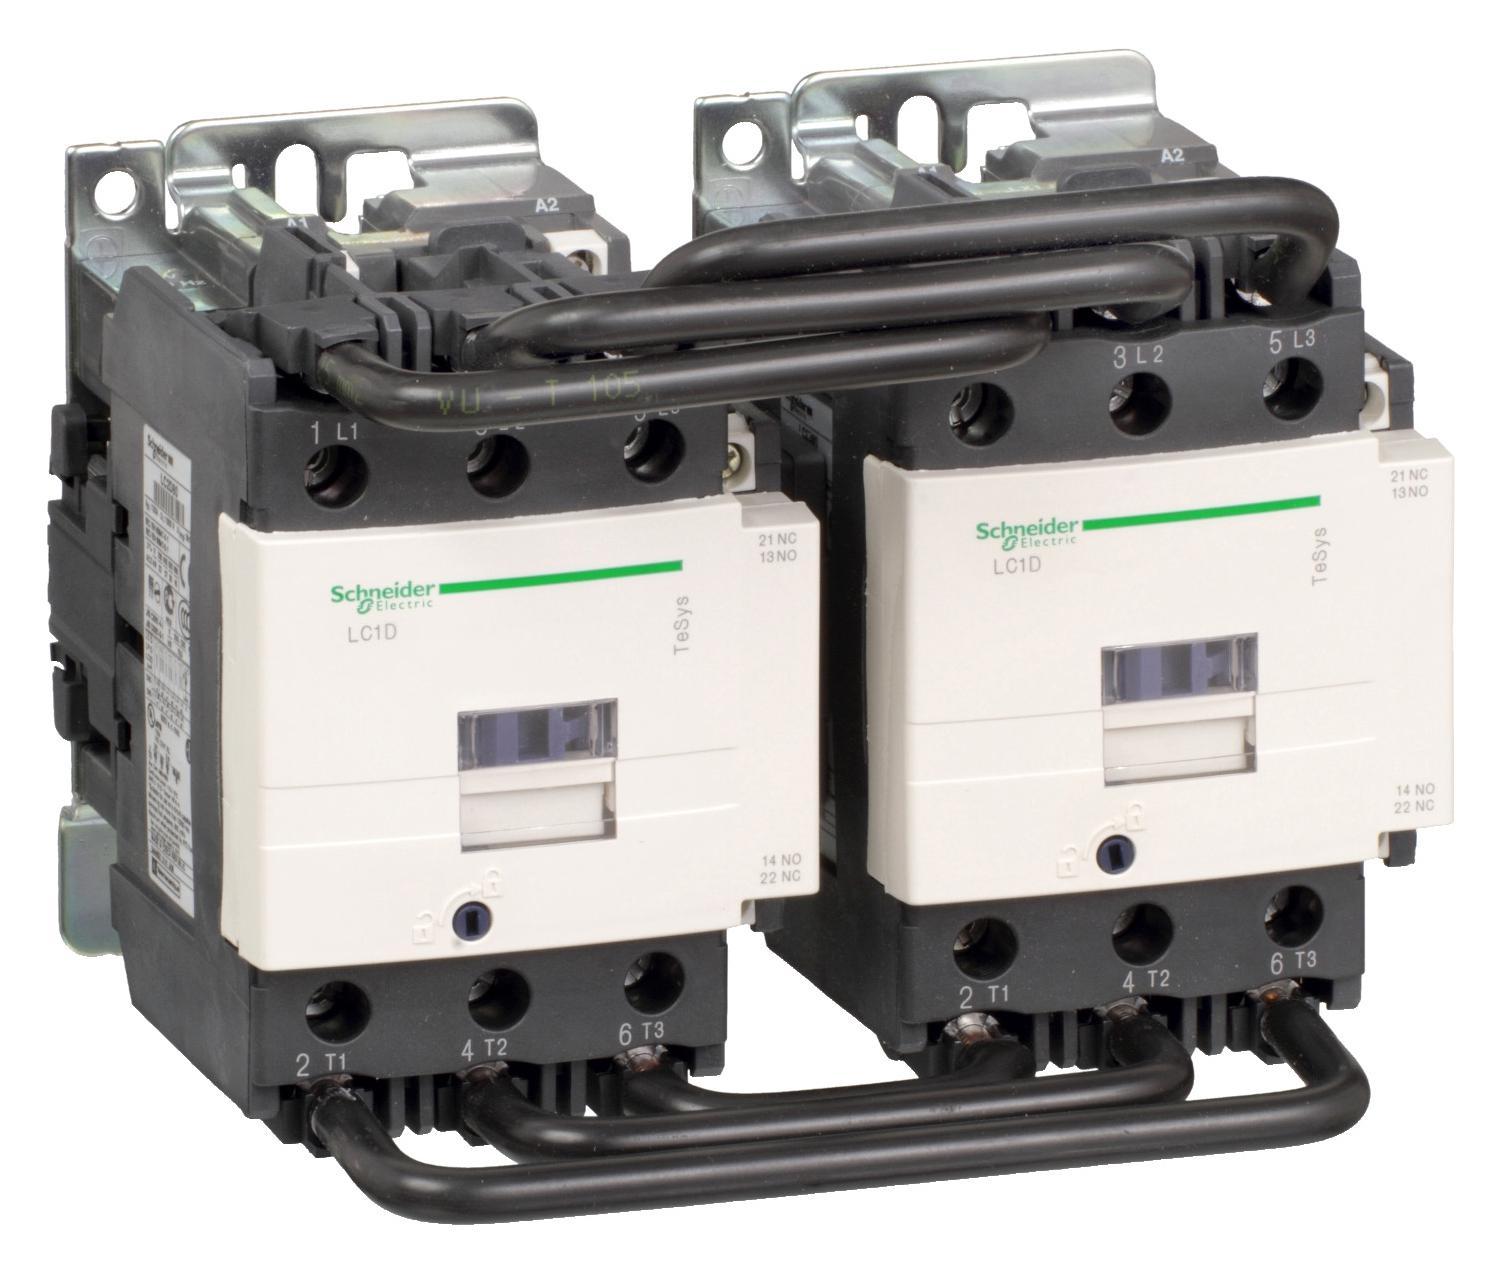 Schneider LC2D95F7 Contc 110V 50/60Hz